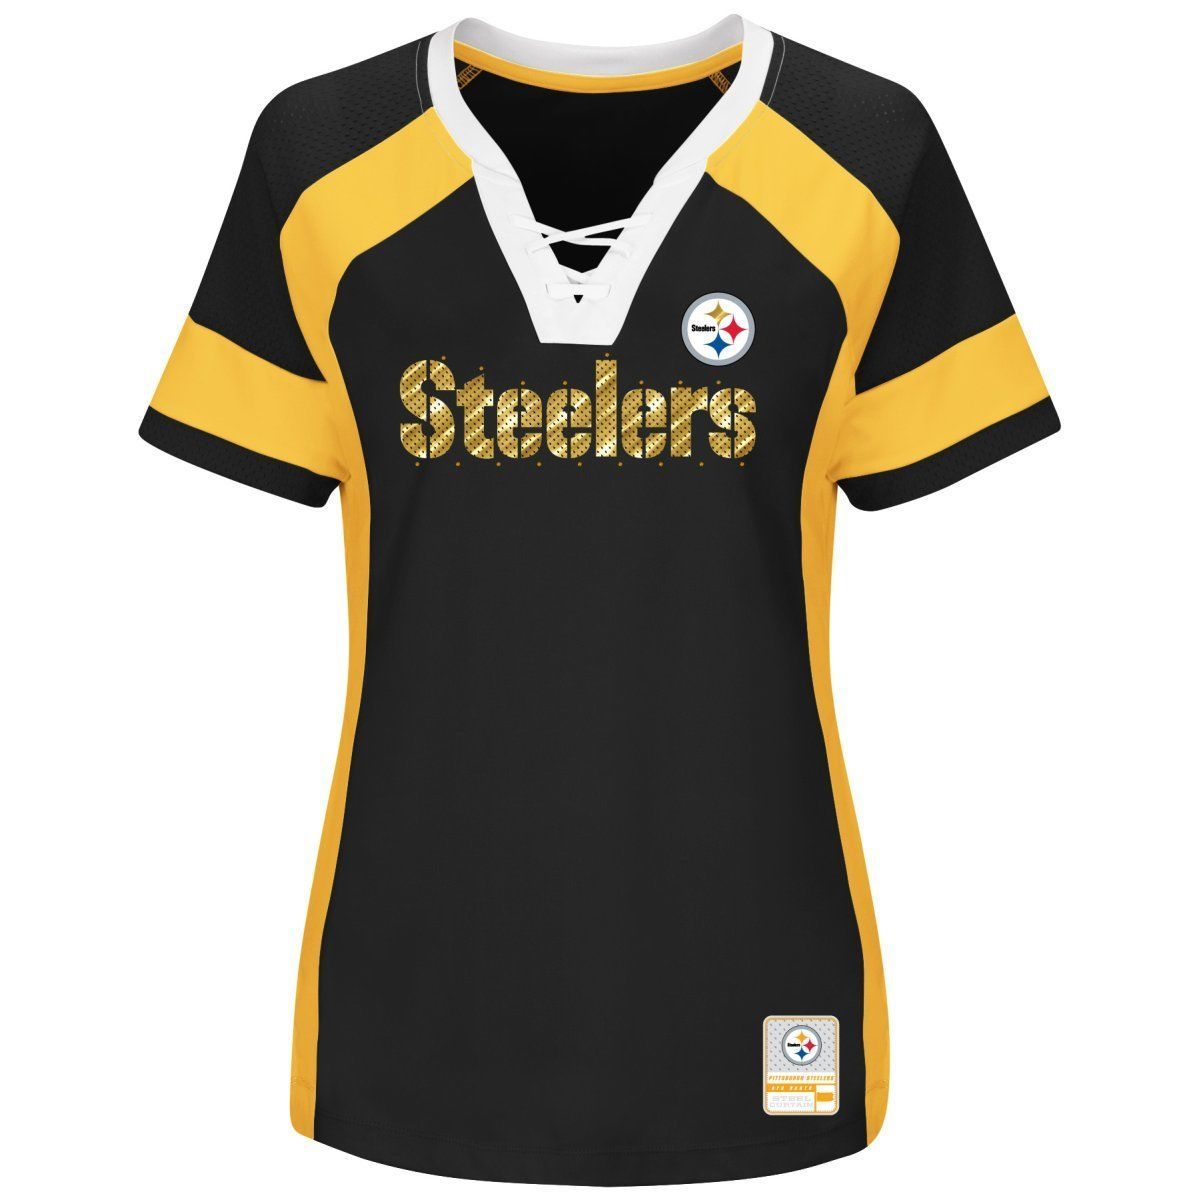 aaeaa077a Green Bay Packers Women s Majestic Draft Me V-Neck Jersey T-Shirt